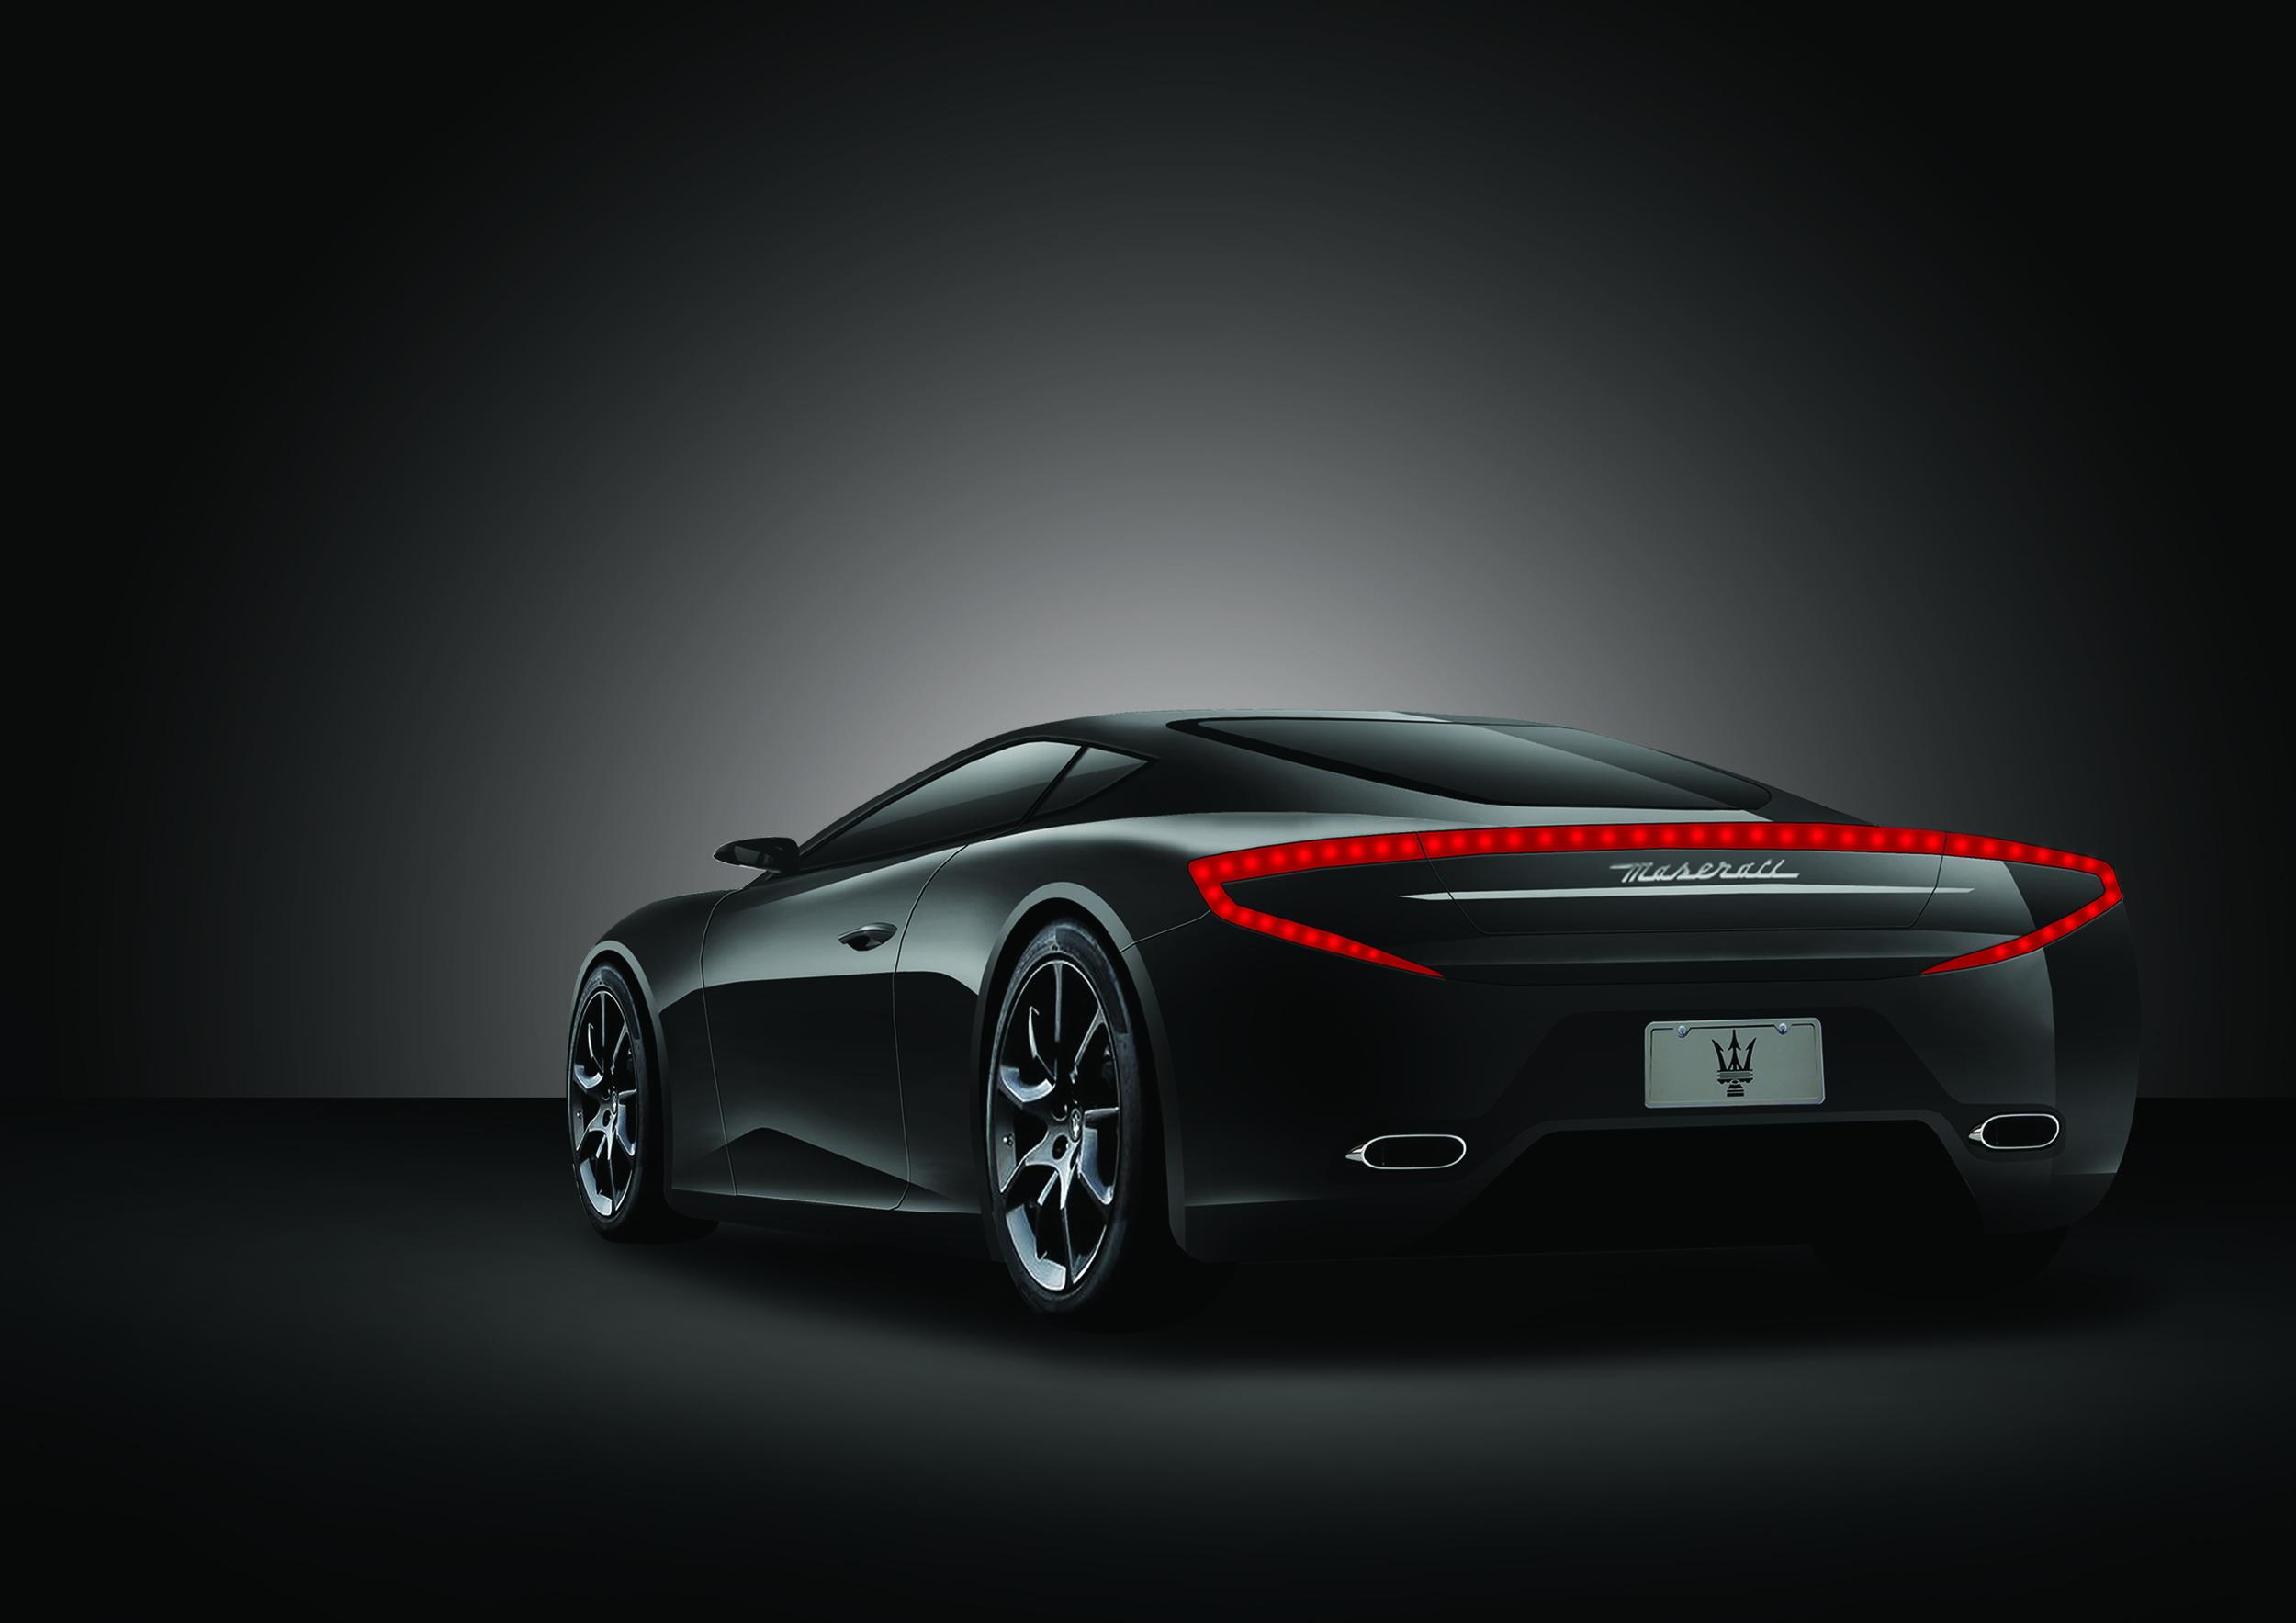 Final render- rear view